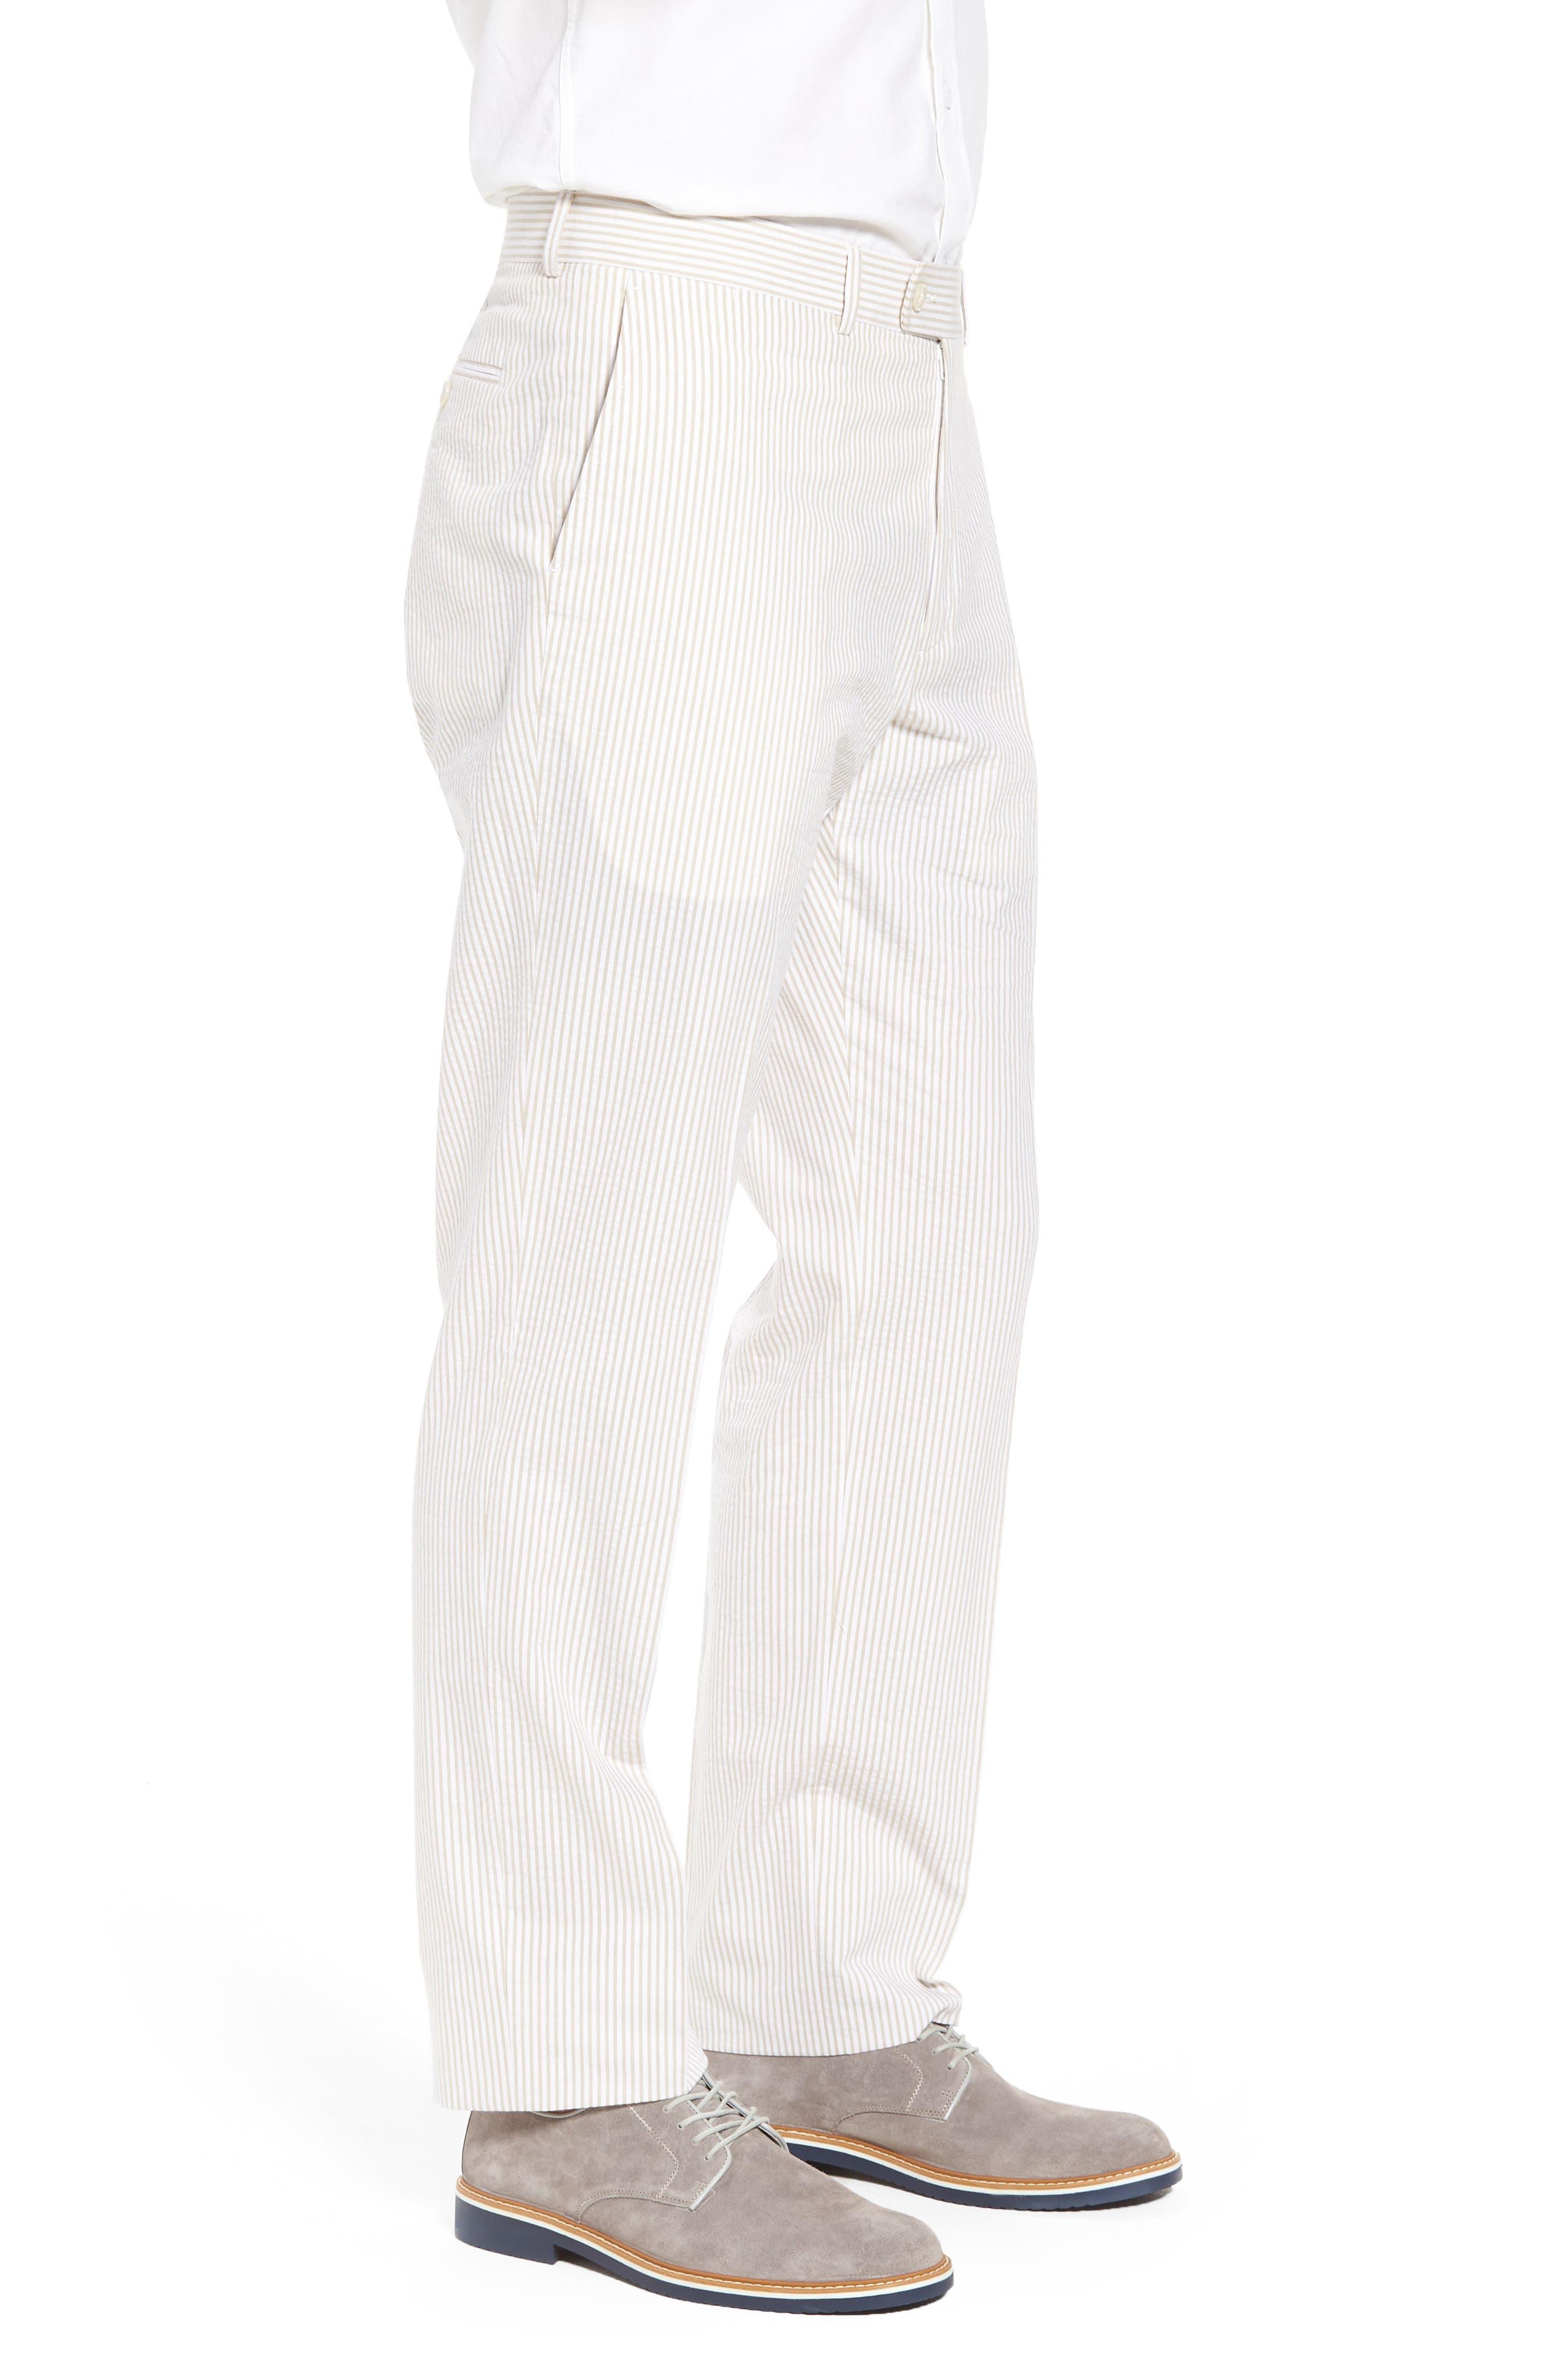 Andrew AIM Flat Front Seersucker Trousers,                             Alternate thumbnail 3, color,                             250